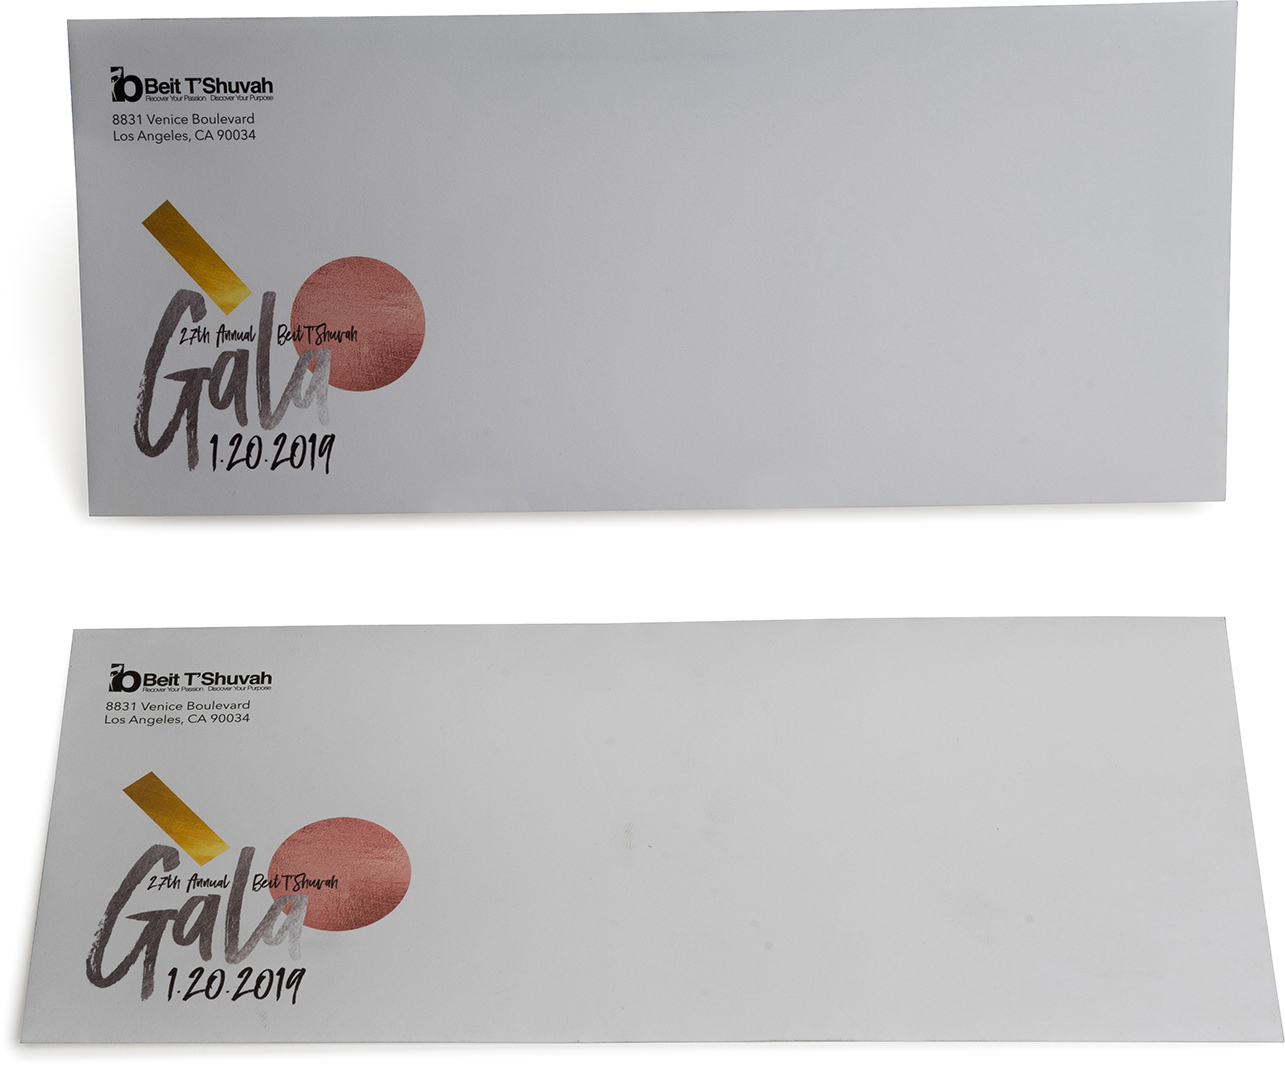 Gala event custom envelope, metallic inks, digital